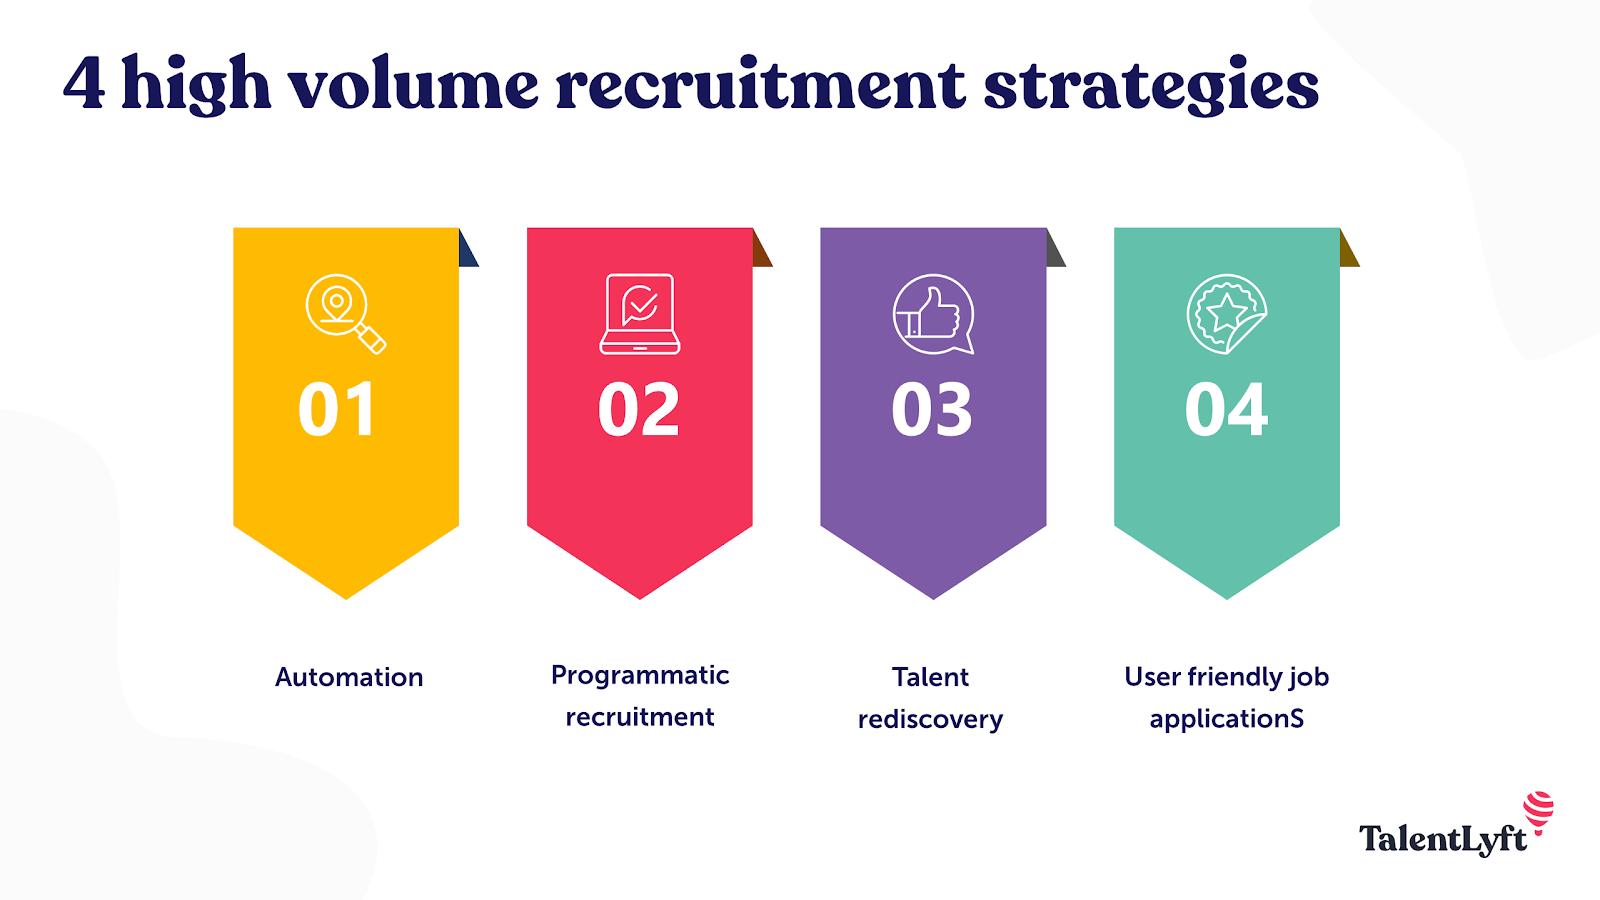 Top 4 high volume recruitment strategies